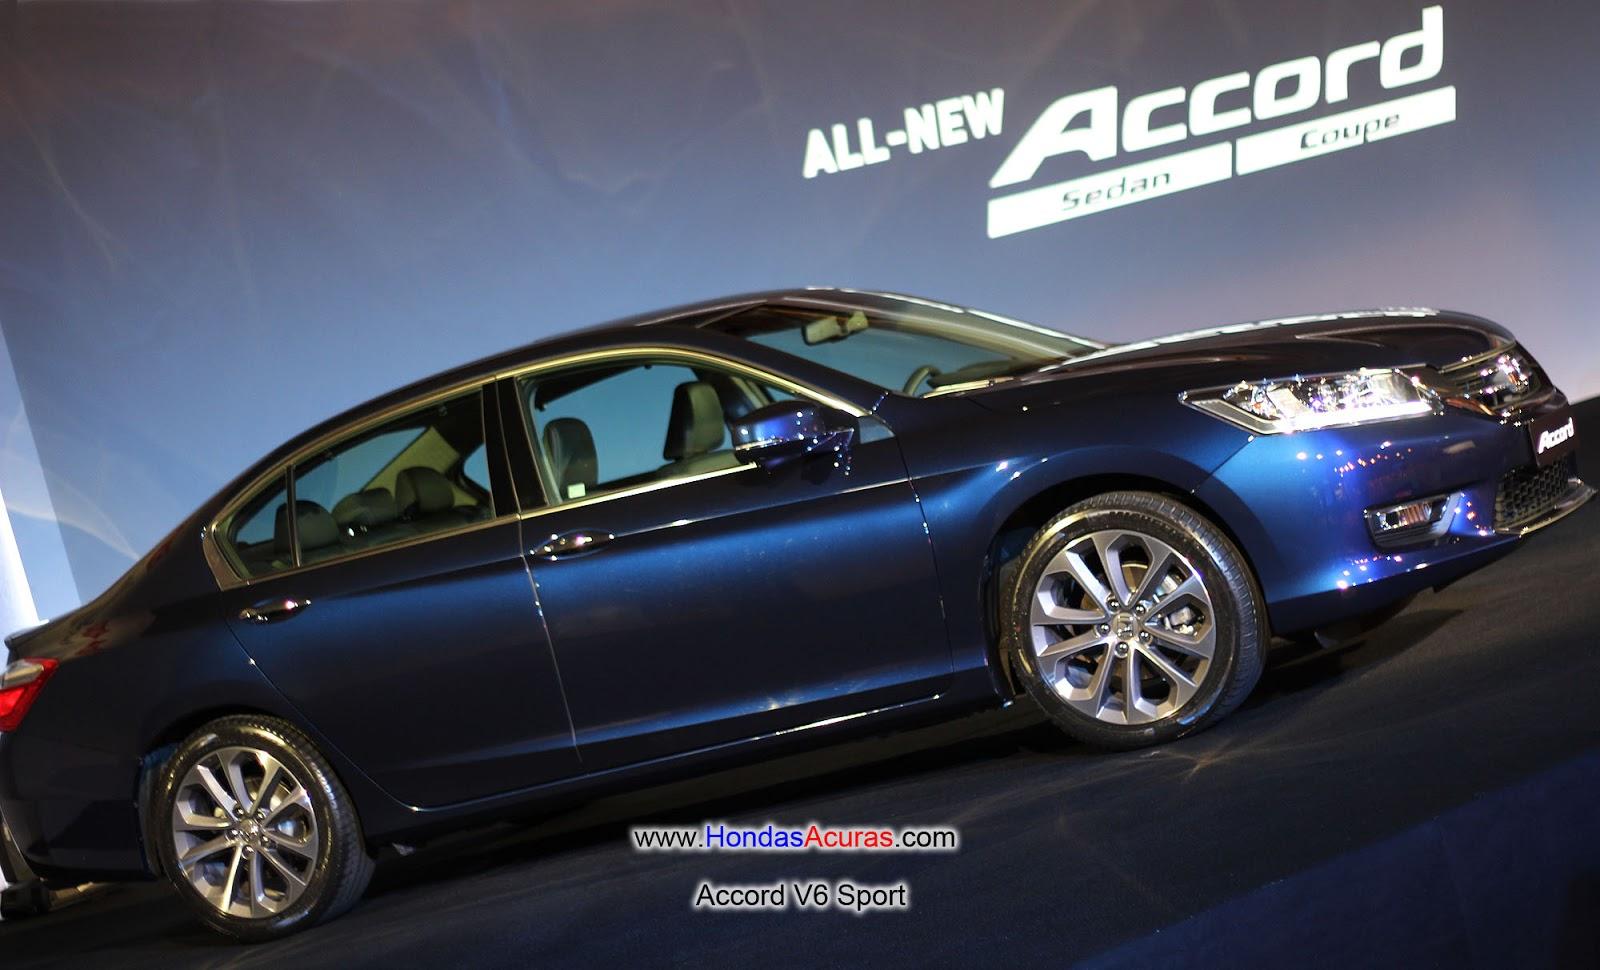 2016 Honda Accord Sedan Accord sedan v6 sport launched